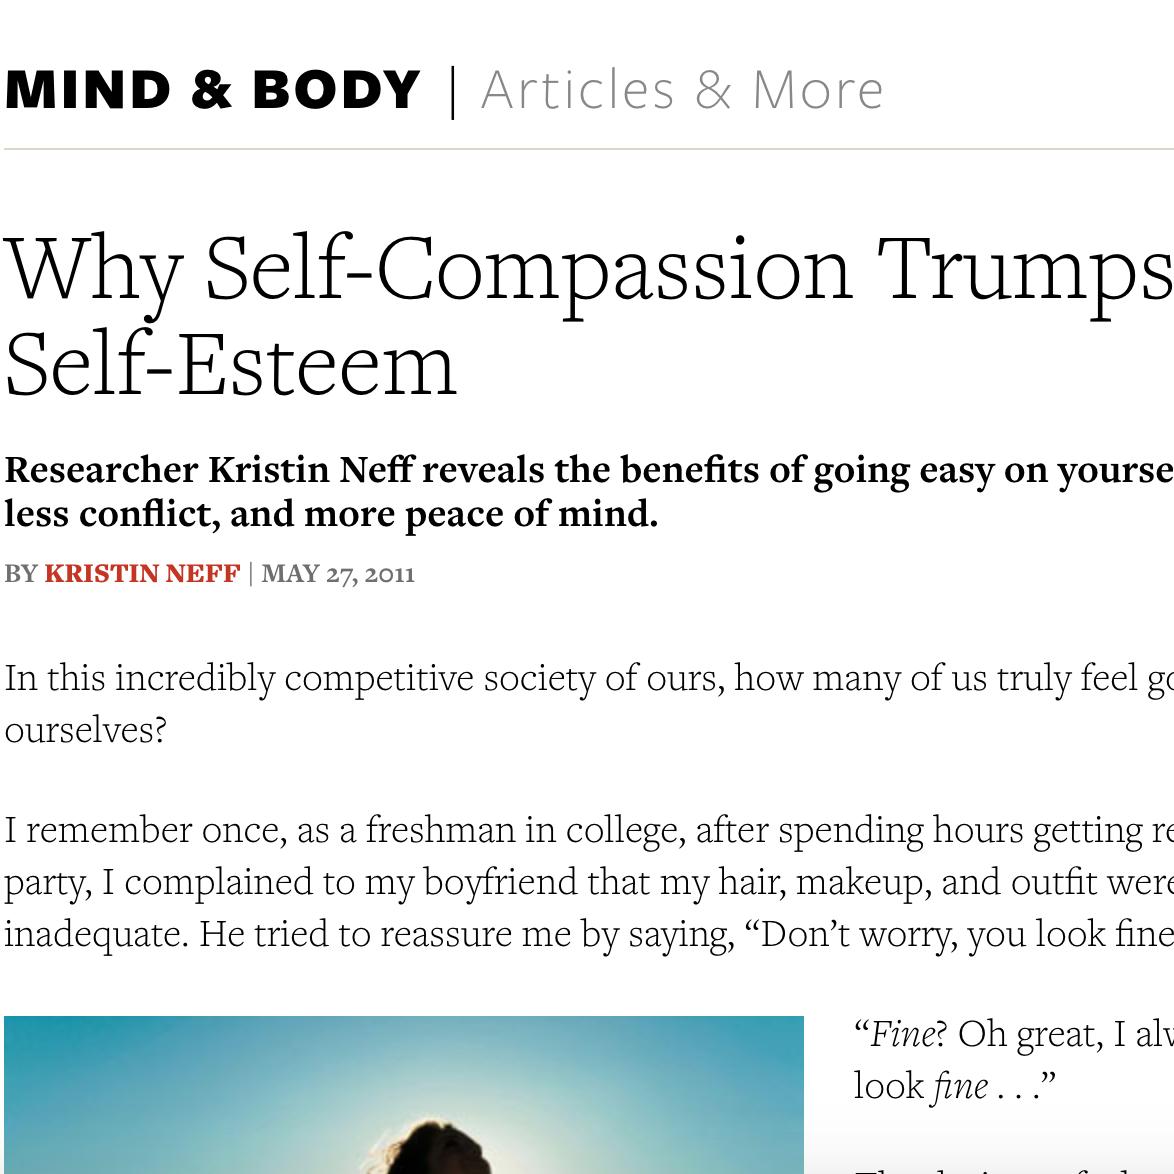 self compassion article.jpg